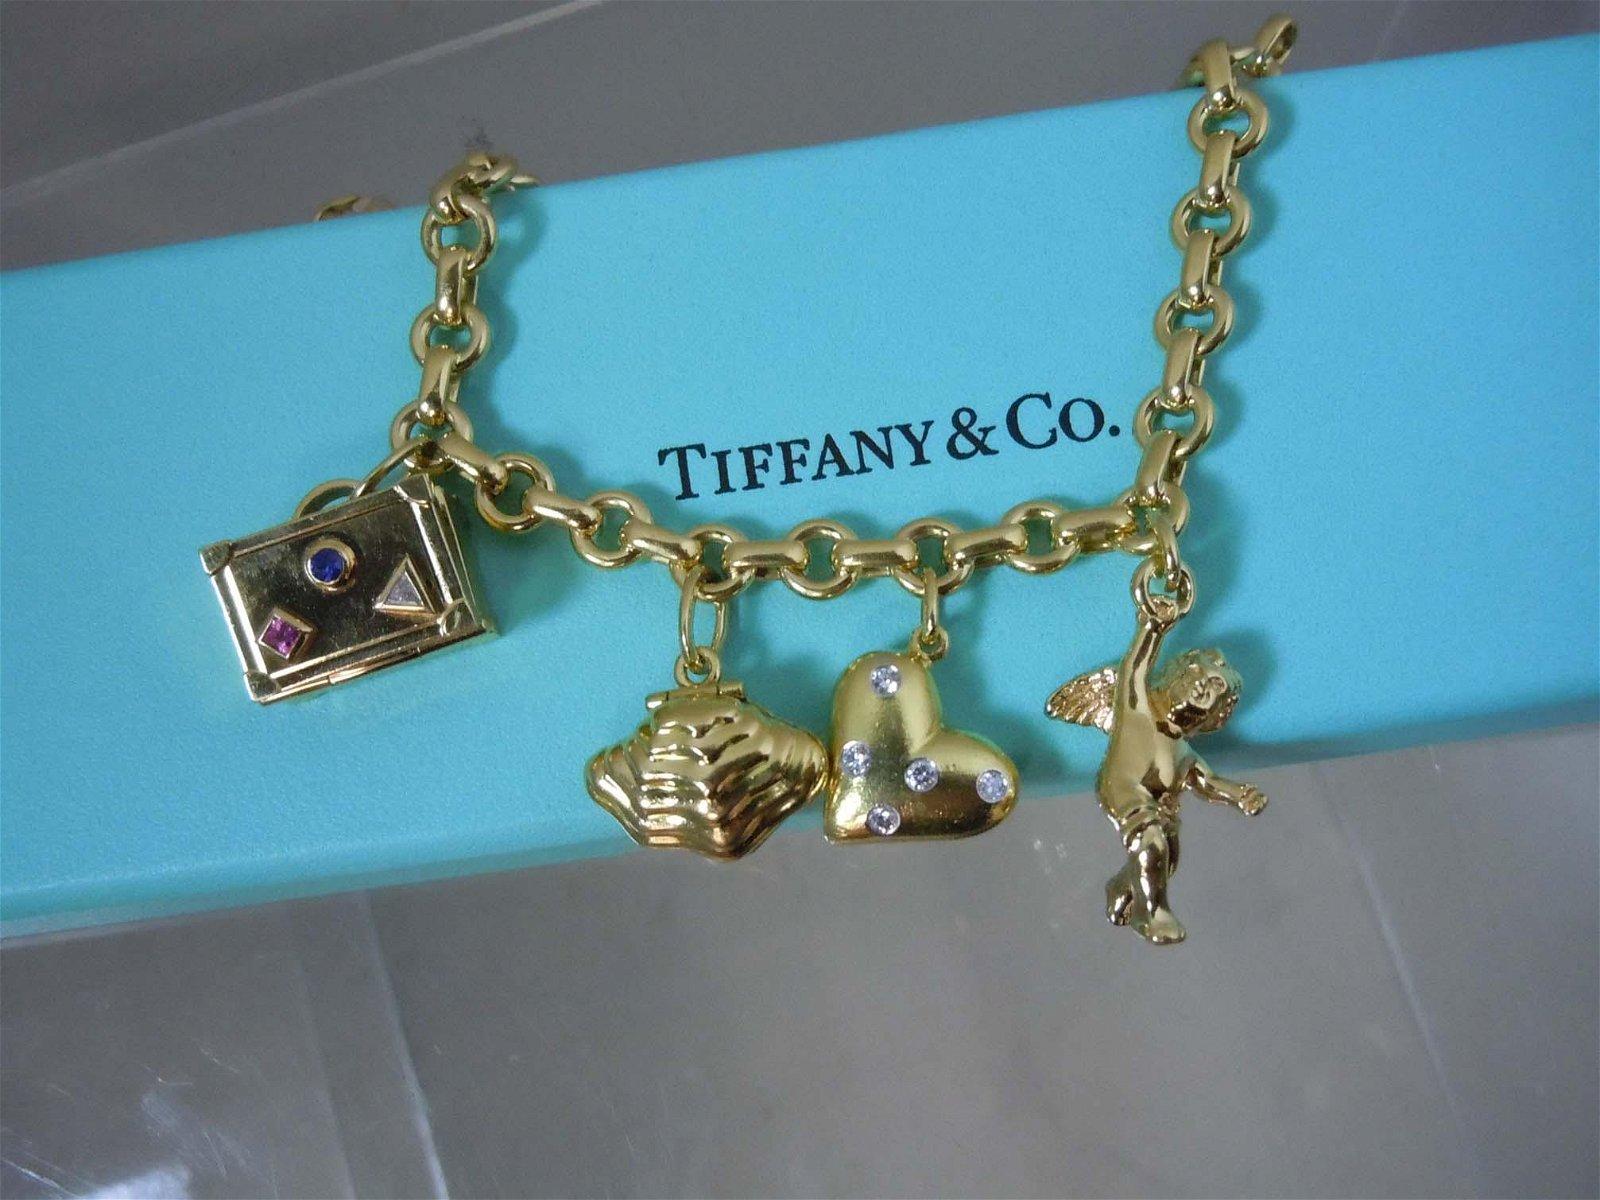 TIFFANY 18KT GOLD CHARM BRACELET - ETOILE DIAMOND HEART